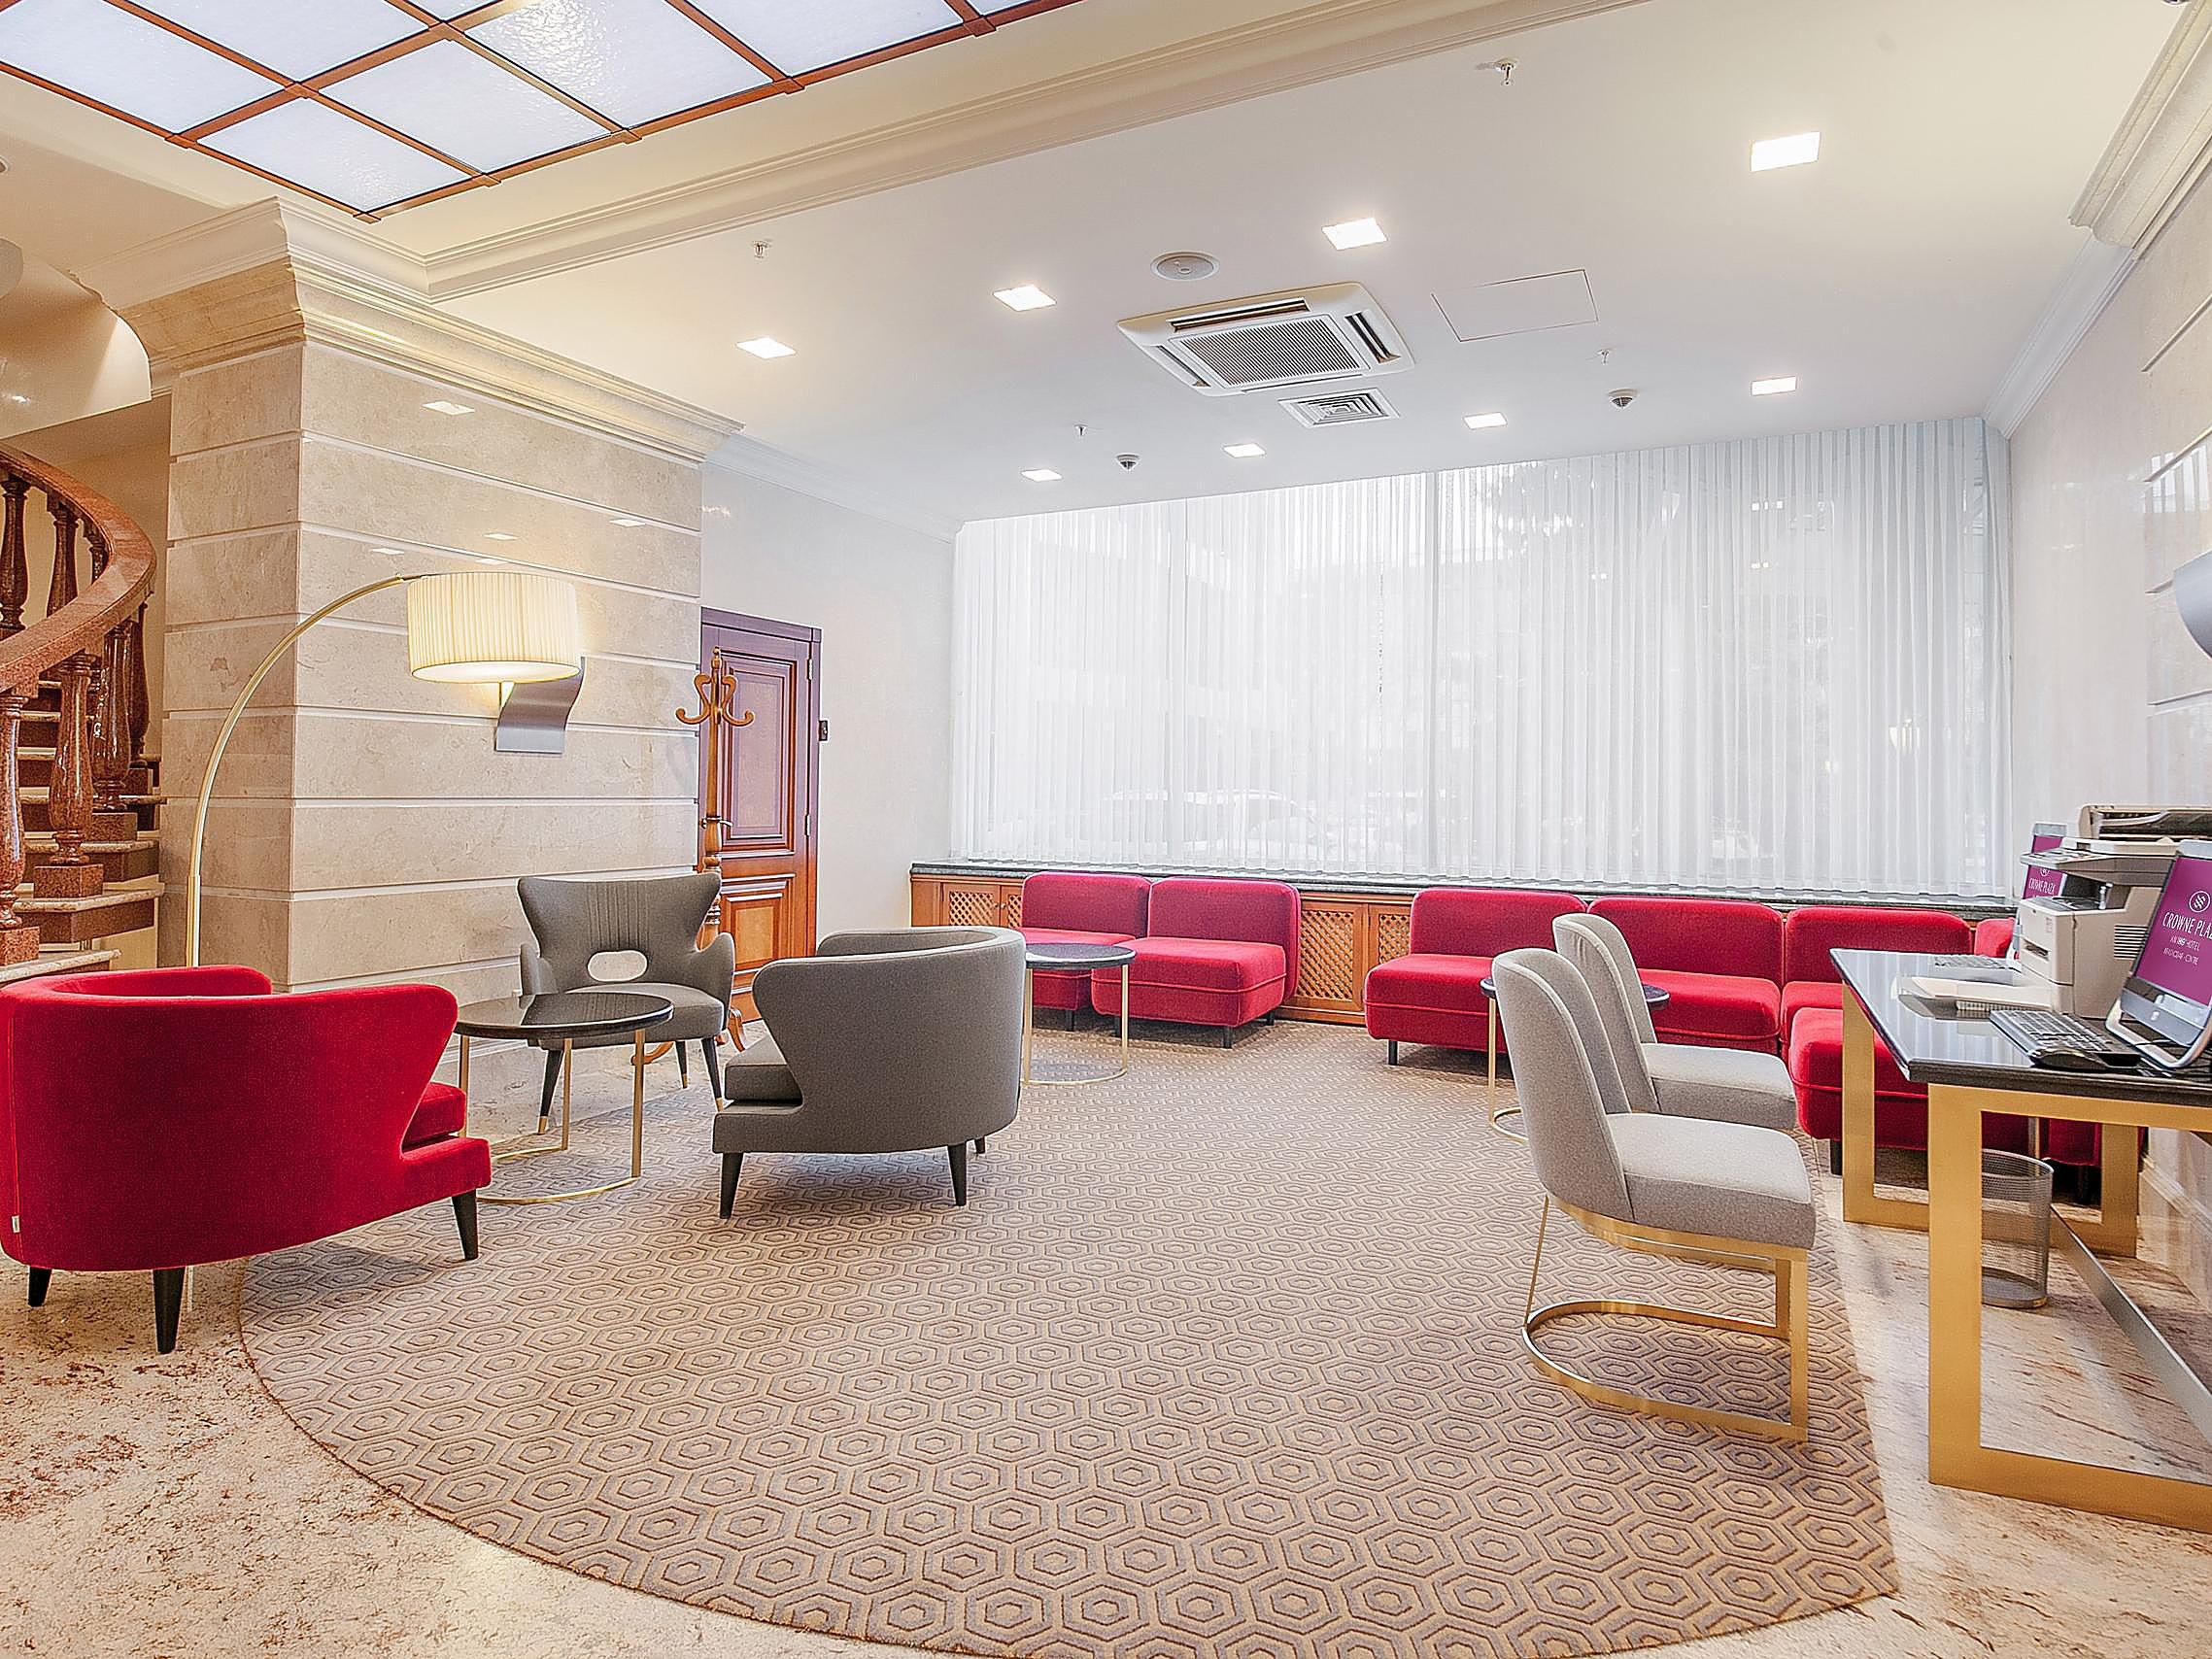 Crowne Plaza Krasnodar Centre Business Hotel Best Price Guarantee